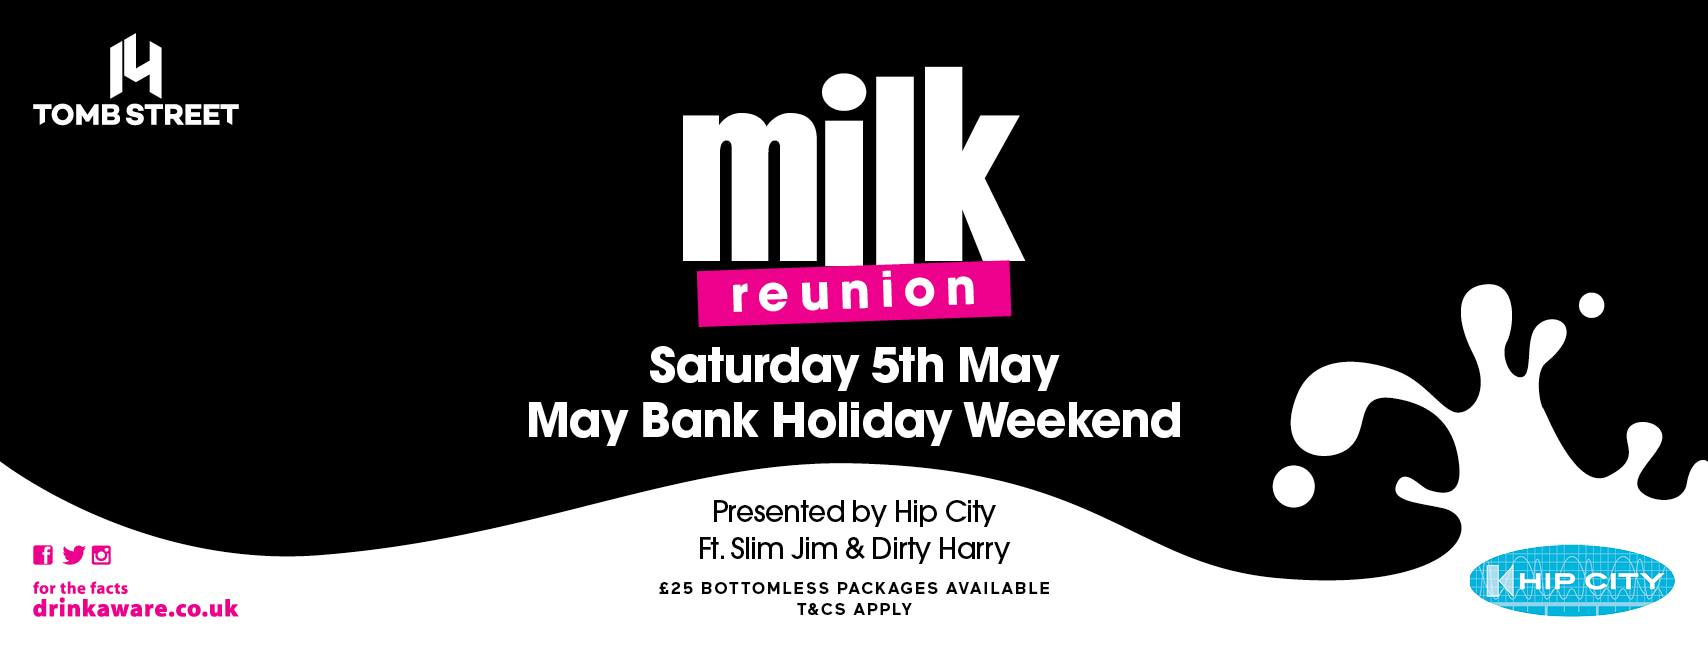 14-Fourteen-5thMay-Milk-reunion.jpg